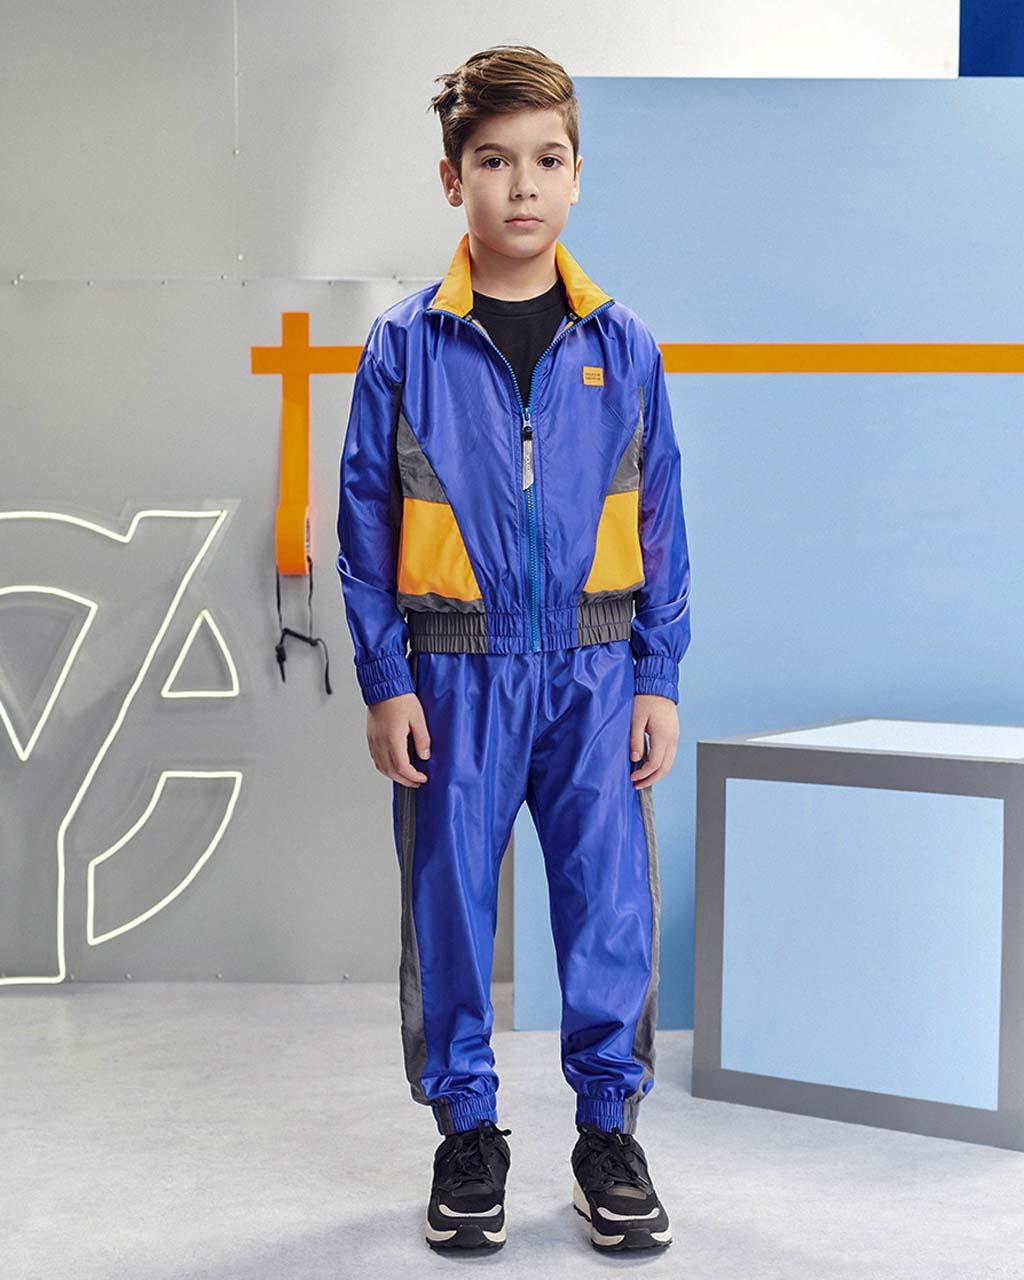 Jaqueta Infantil Corta Vento Esporte Azul Detalhe Neon Youccie